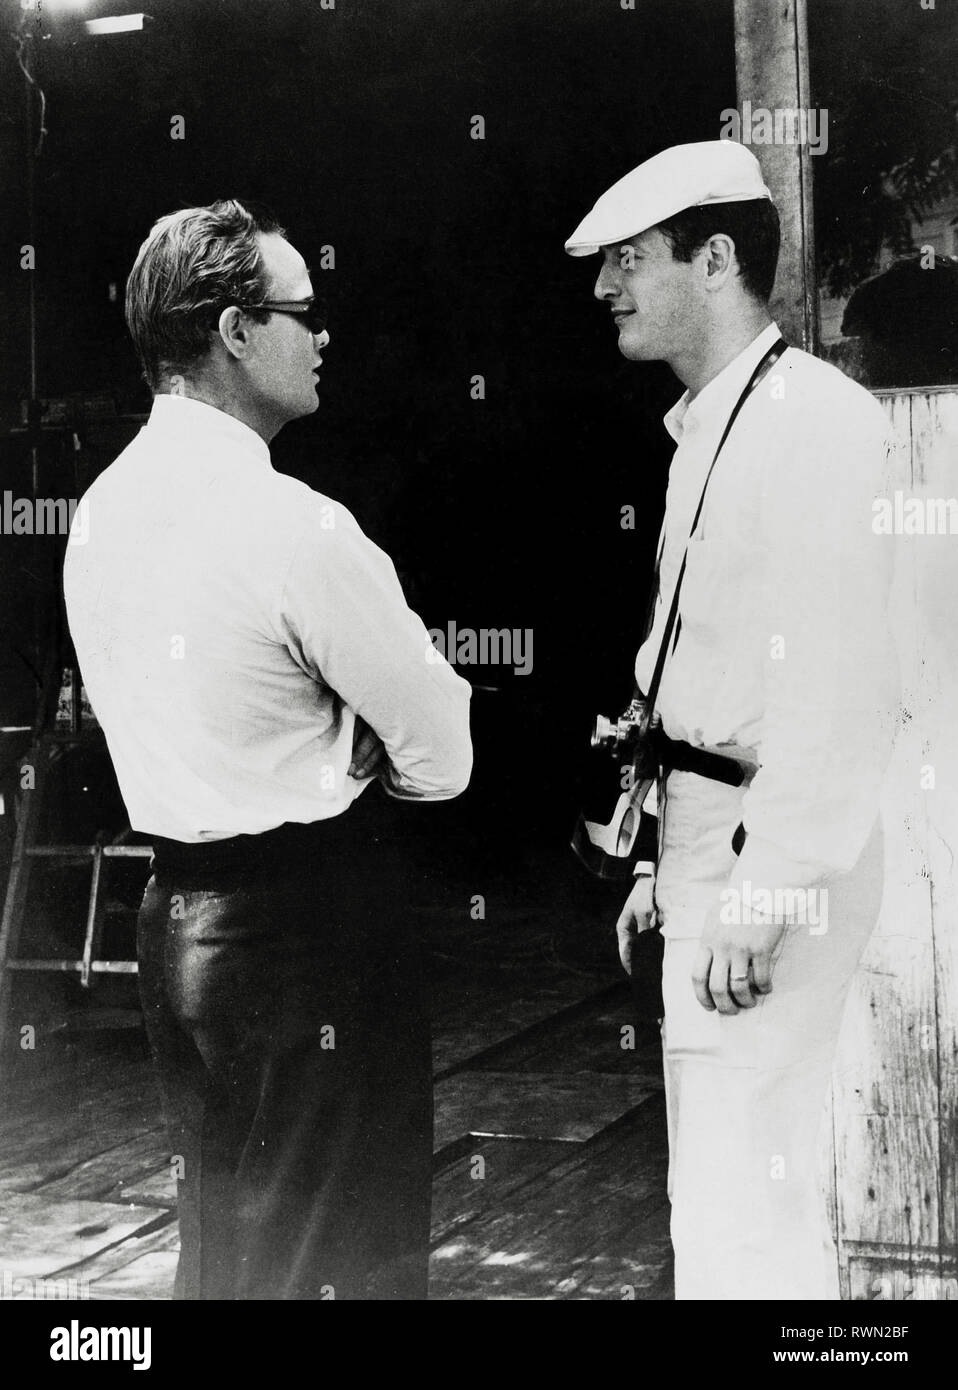 6e612e74 Paul Newman, Marlon Brando, on the set of Brando's film